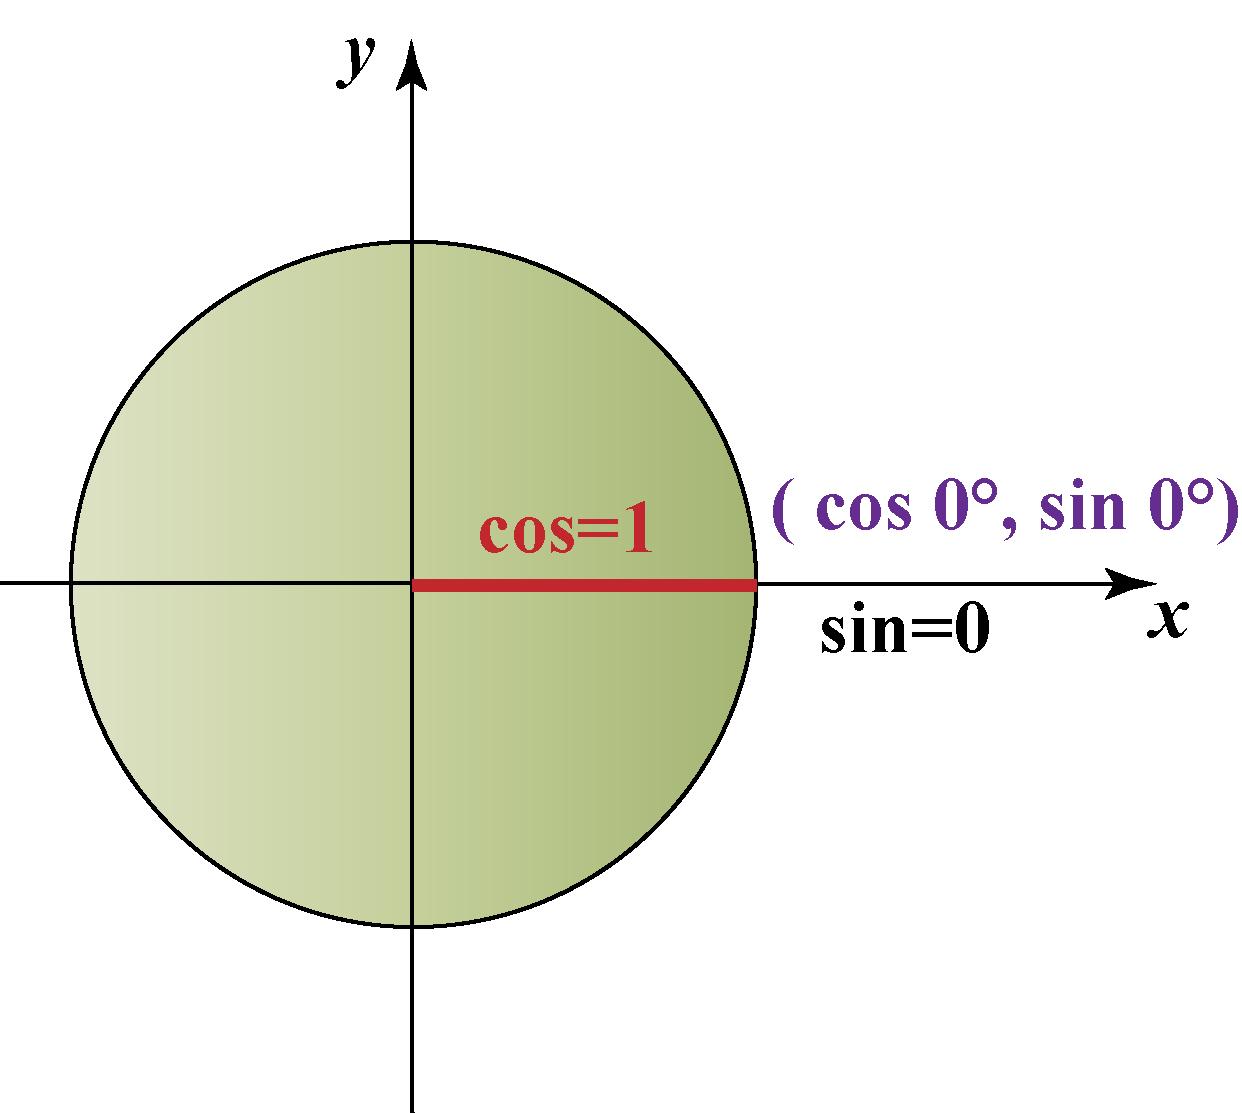 Sin 0 in unit circle